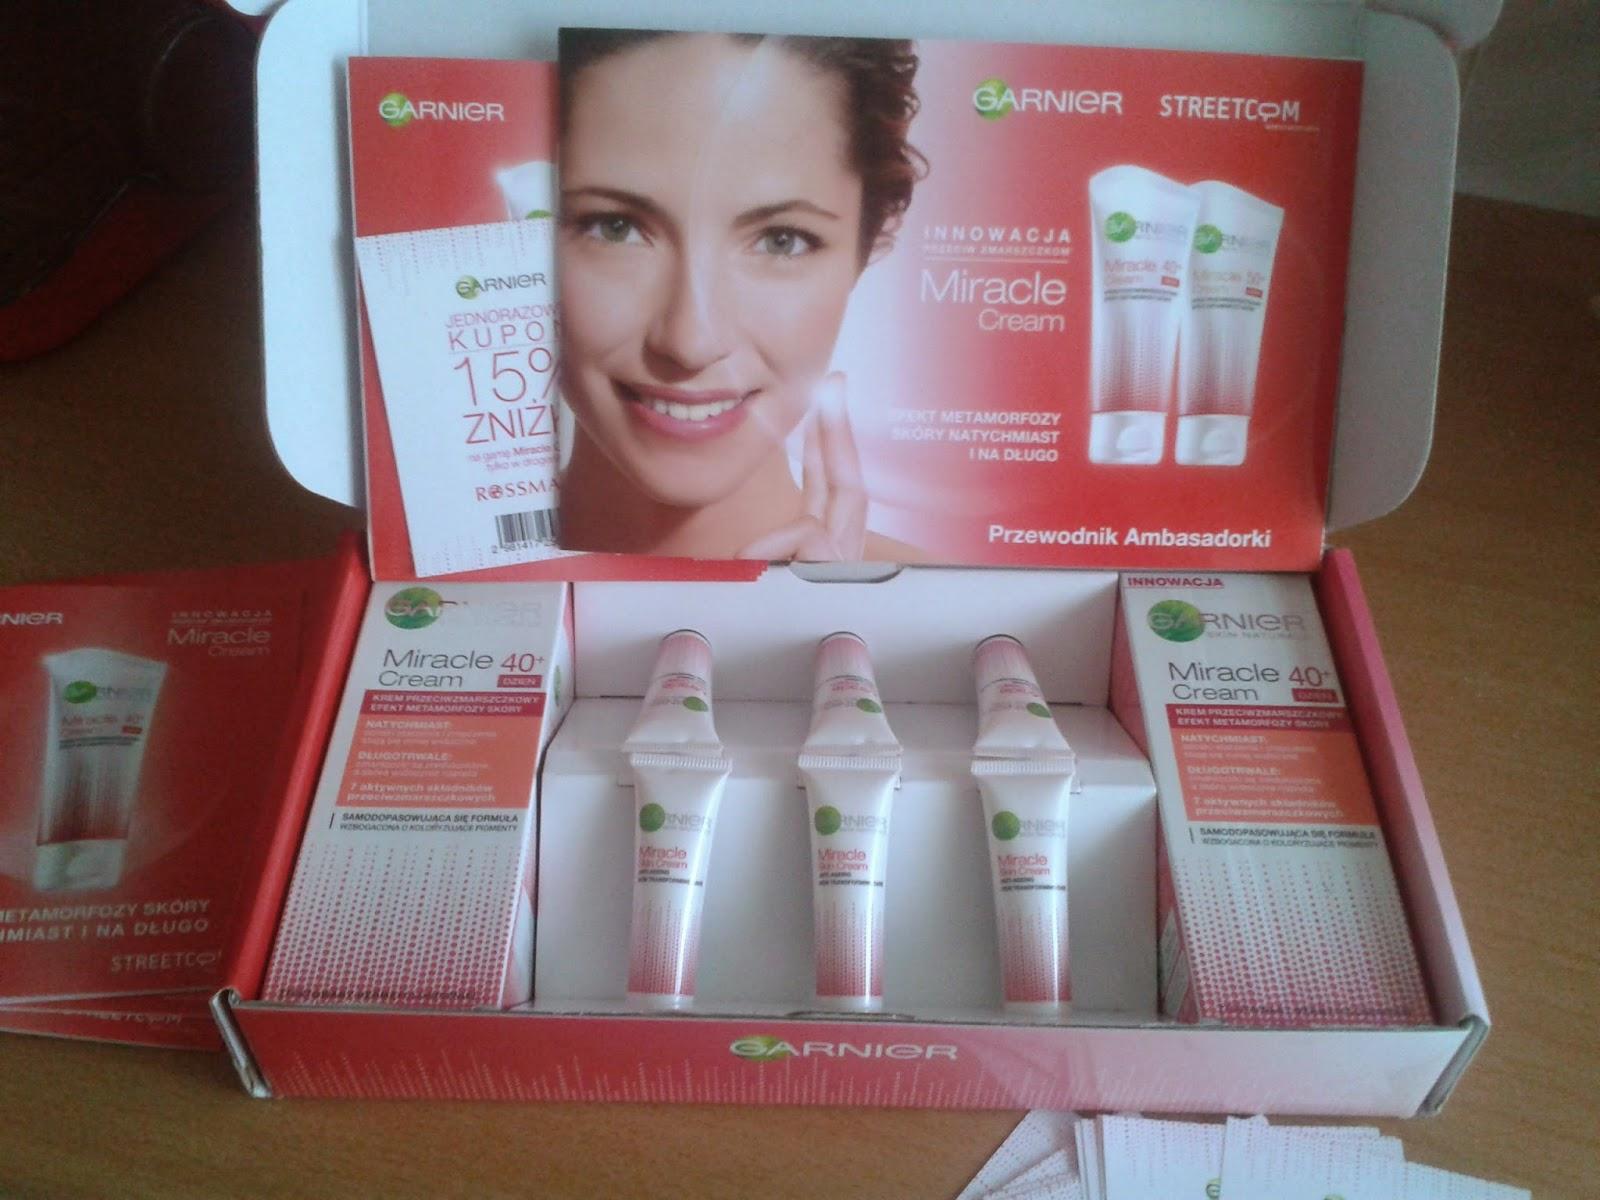 Kampania Streetcom Garnier Miracle Cream